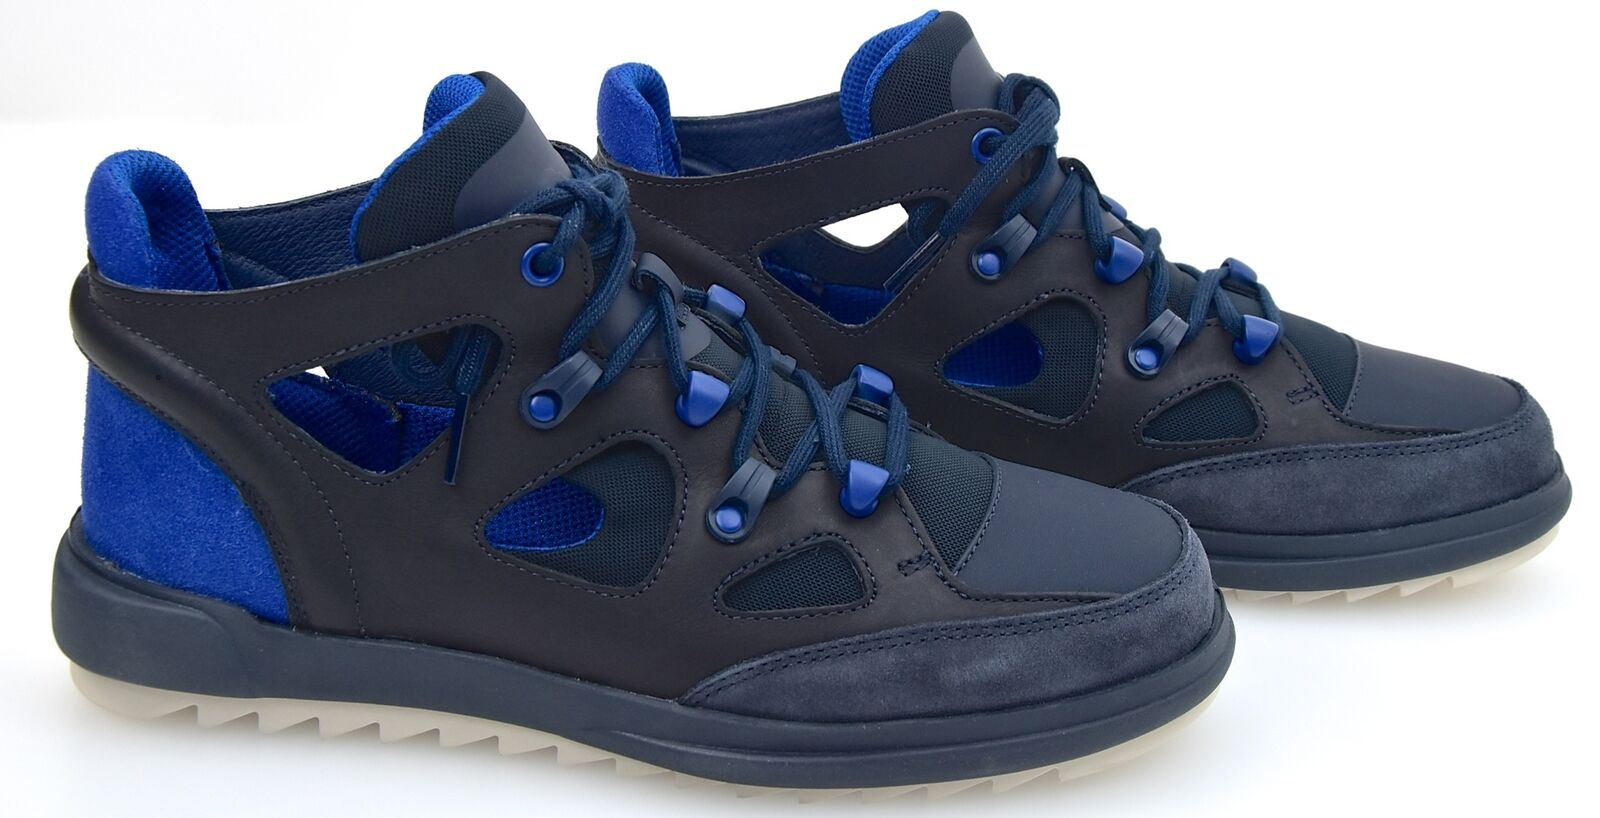 new style b8d0b 6ac14 Nike Air Foamposite One PRM Silver Volt Volt Volt Camo 3M Size 13.  575420-004 jordan penny 28584b